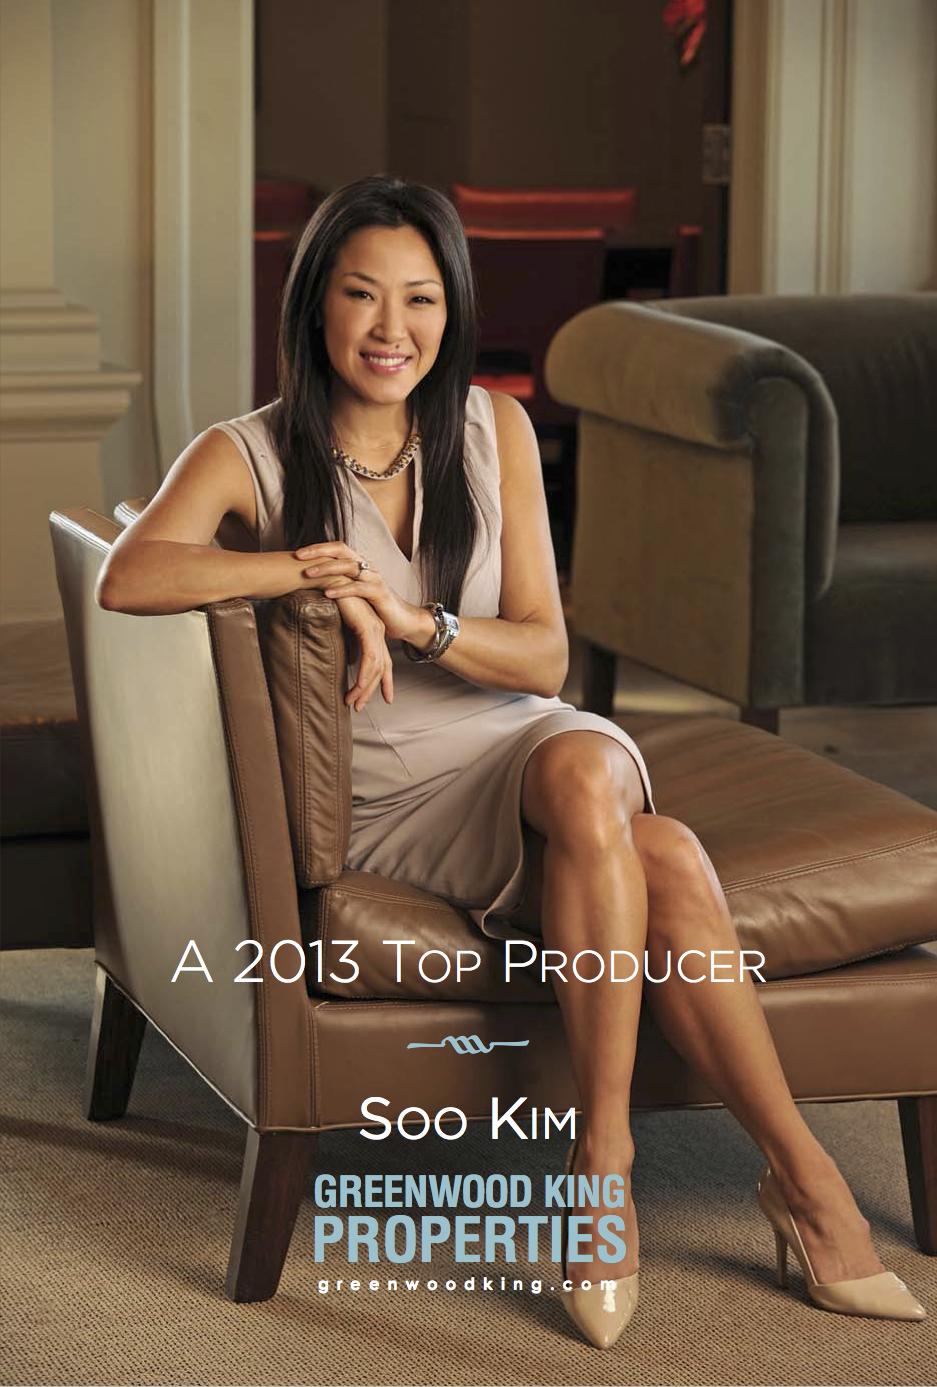 Kim_2013%20Top%20Producer%201.png